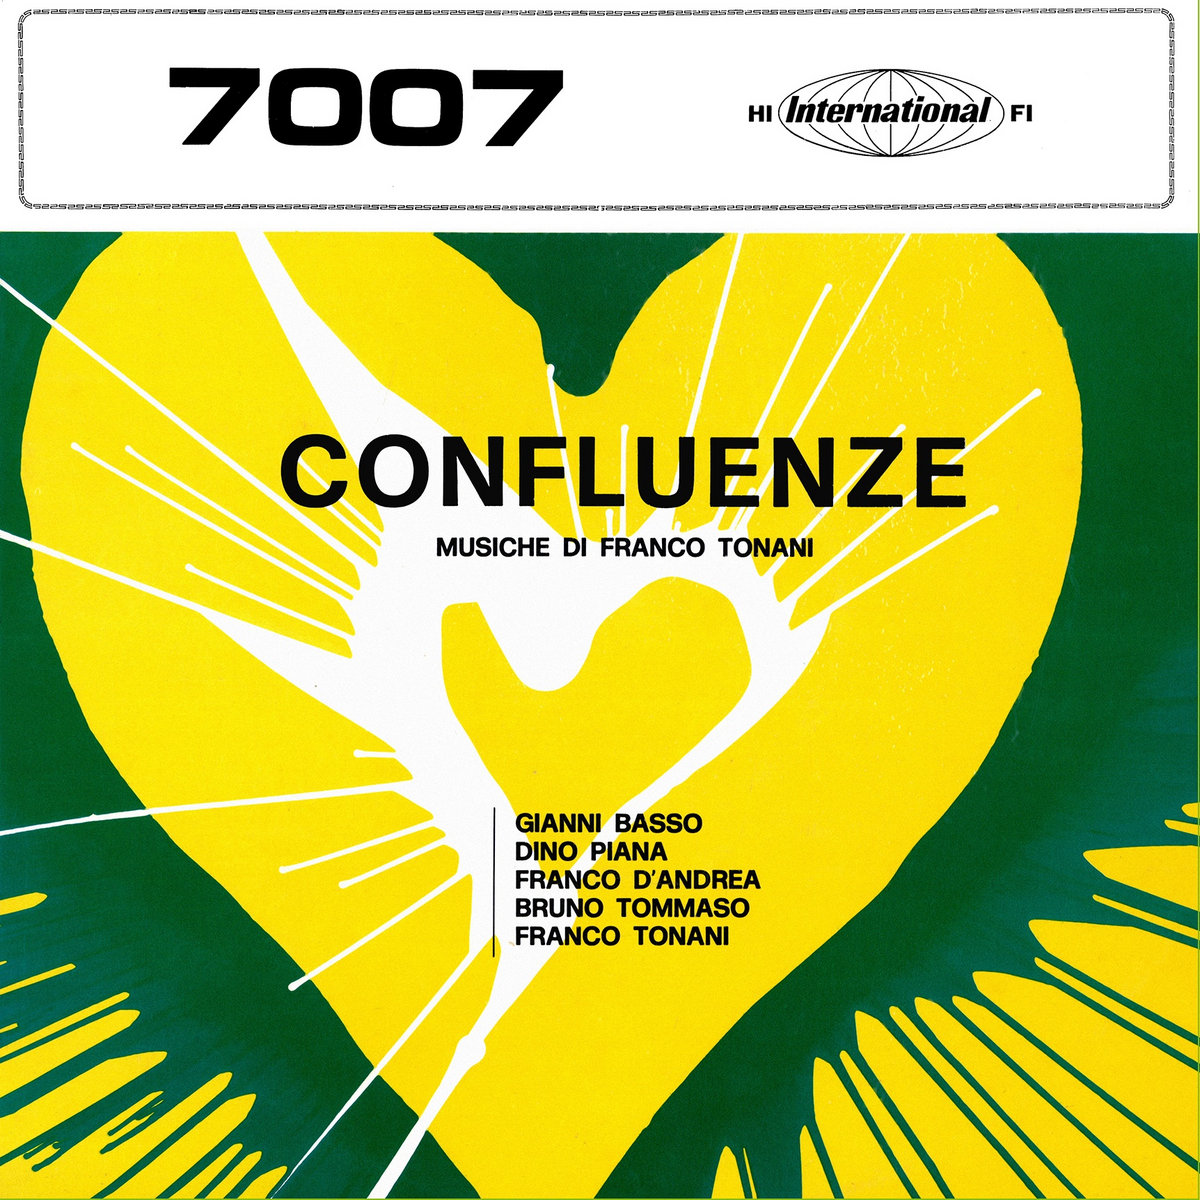 FONIT 7007 - CONFLUENZE